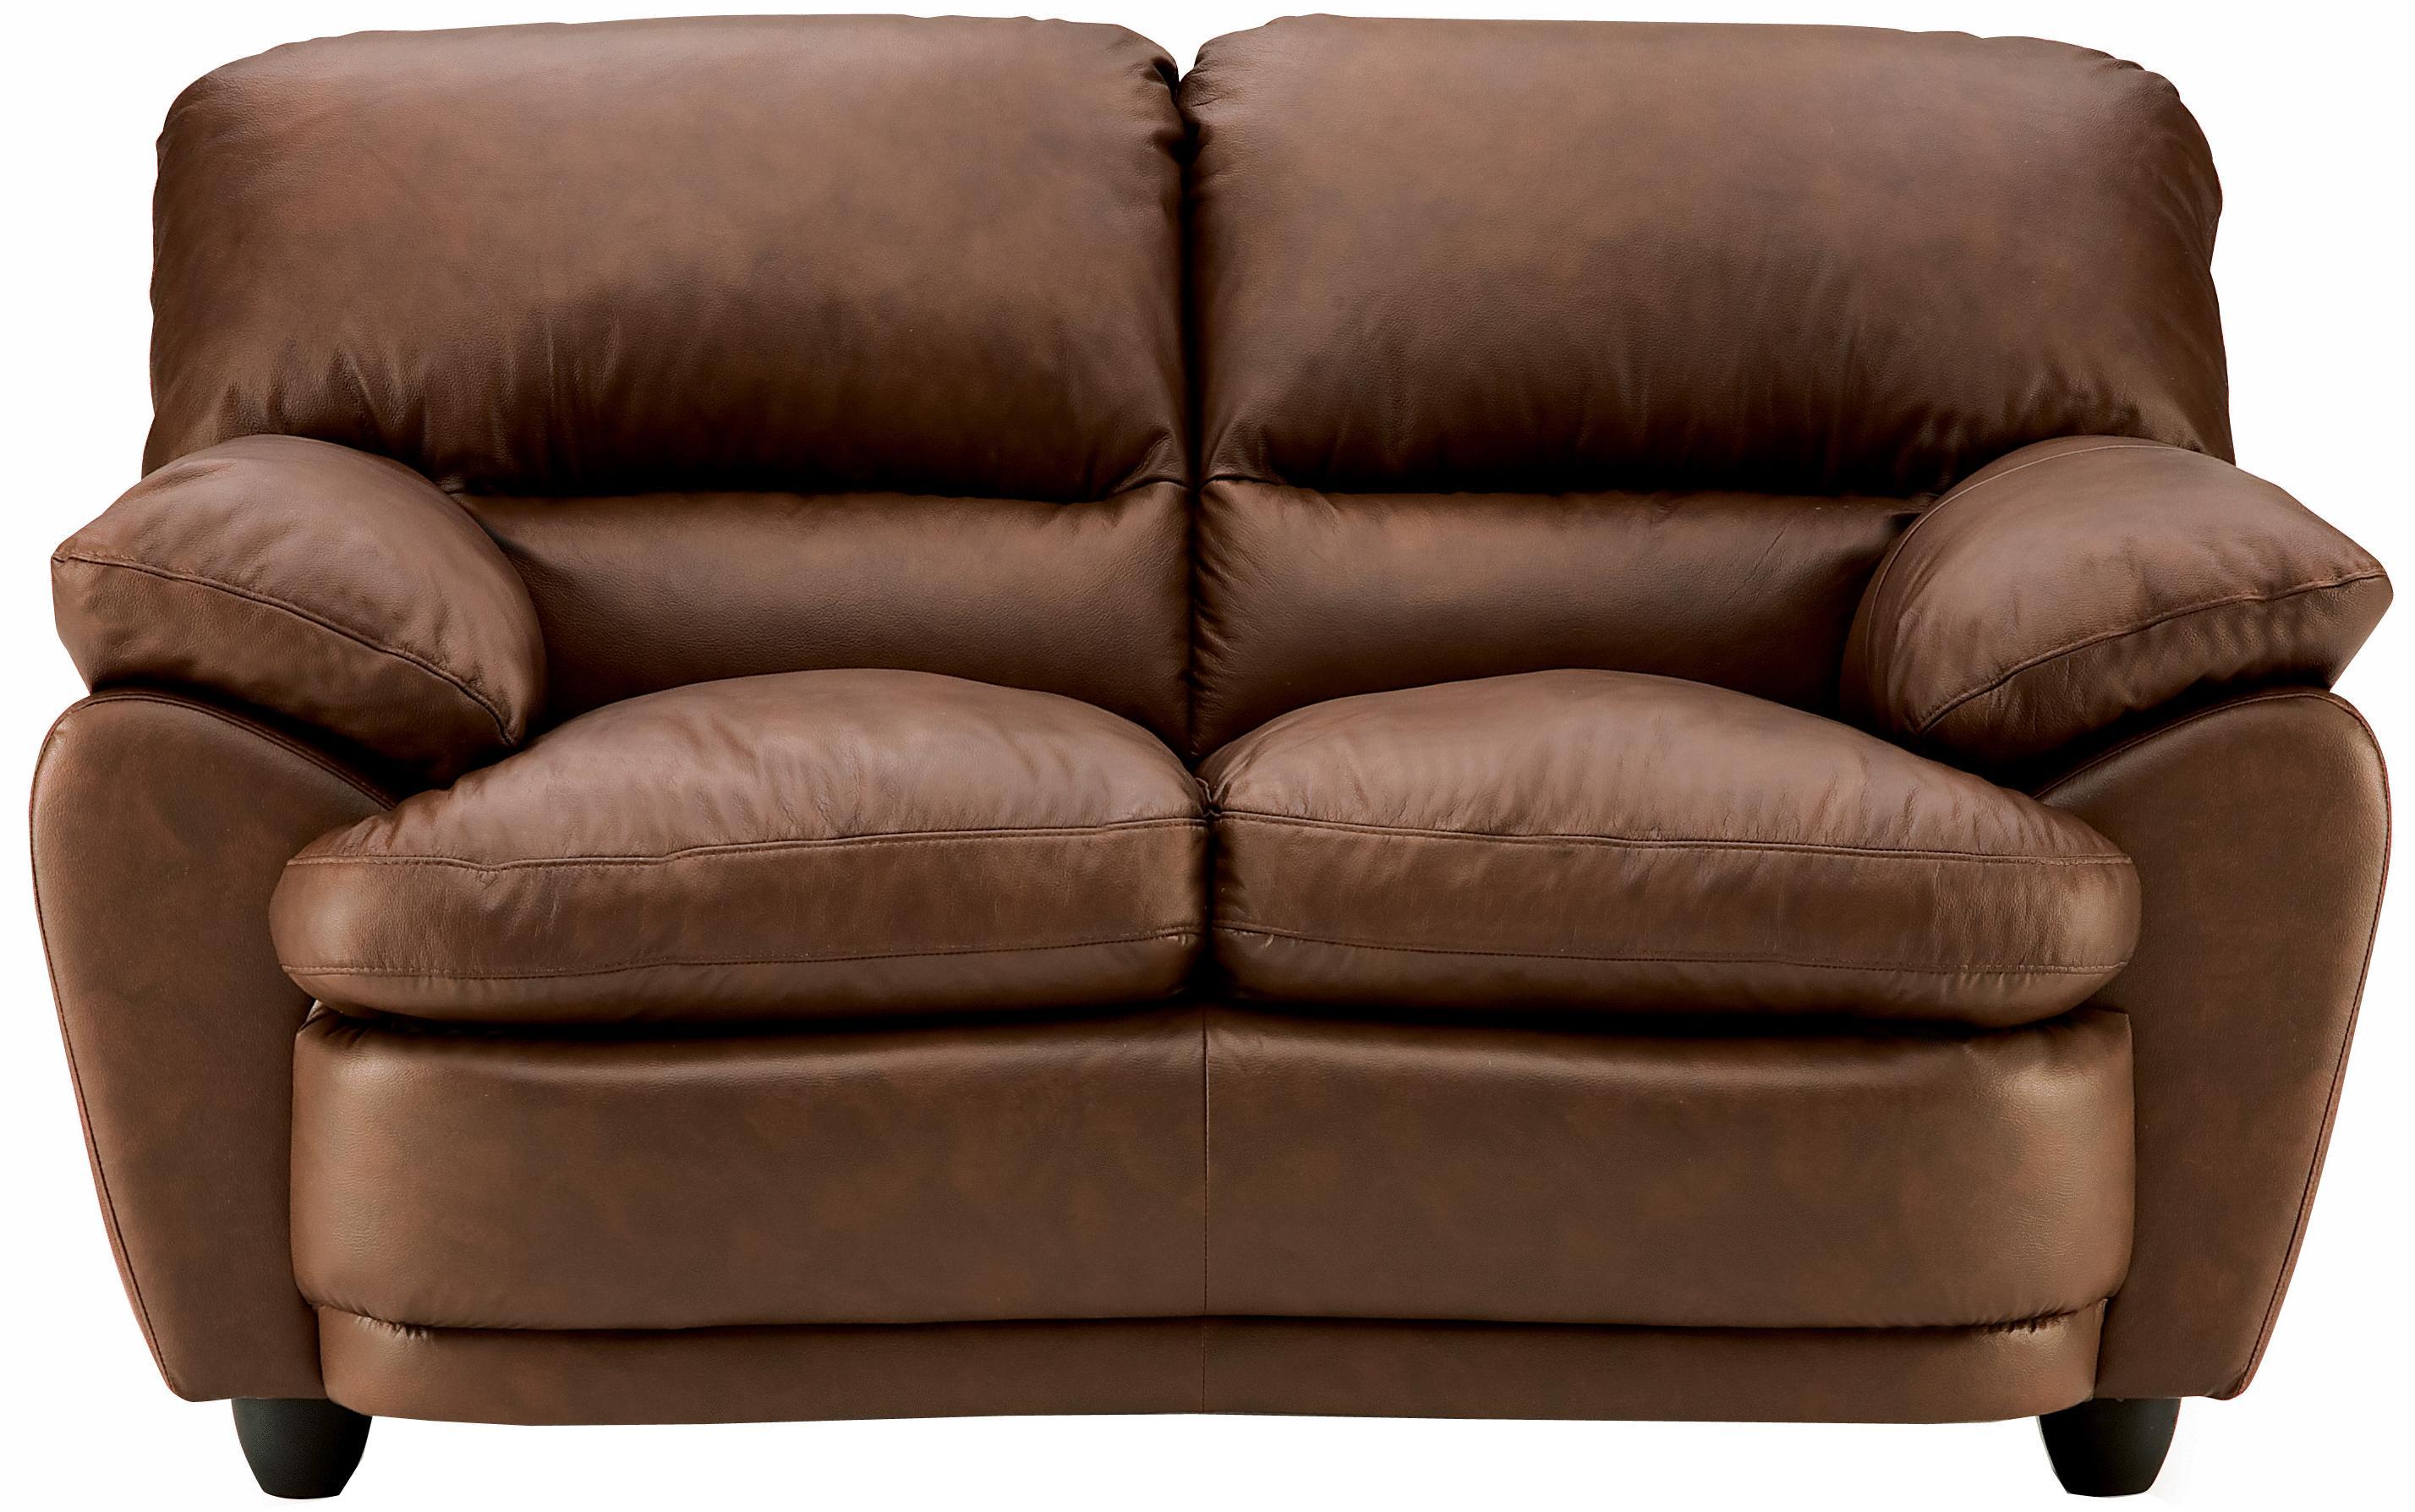 Harley Love Seat by Palliser at Mueller Furniture